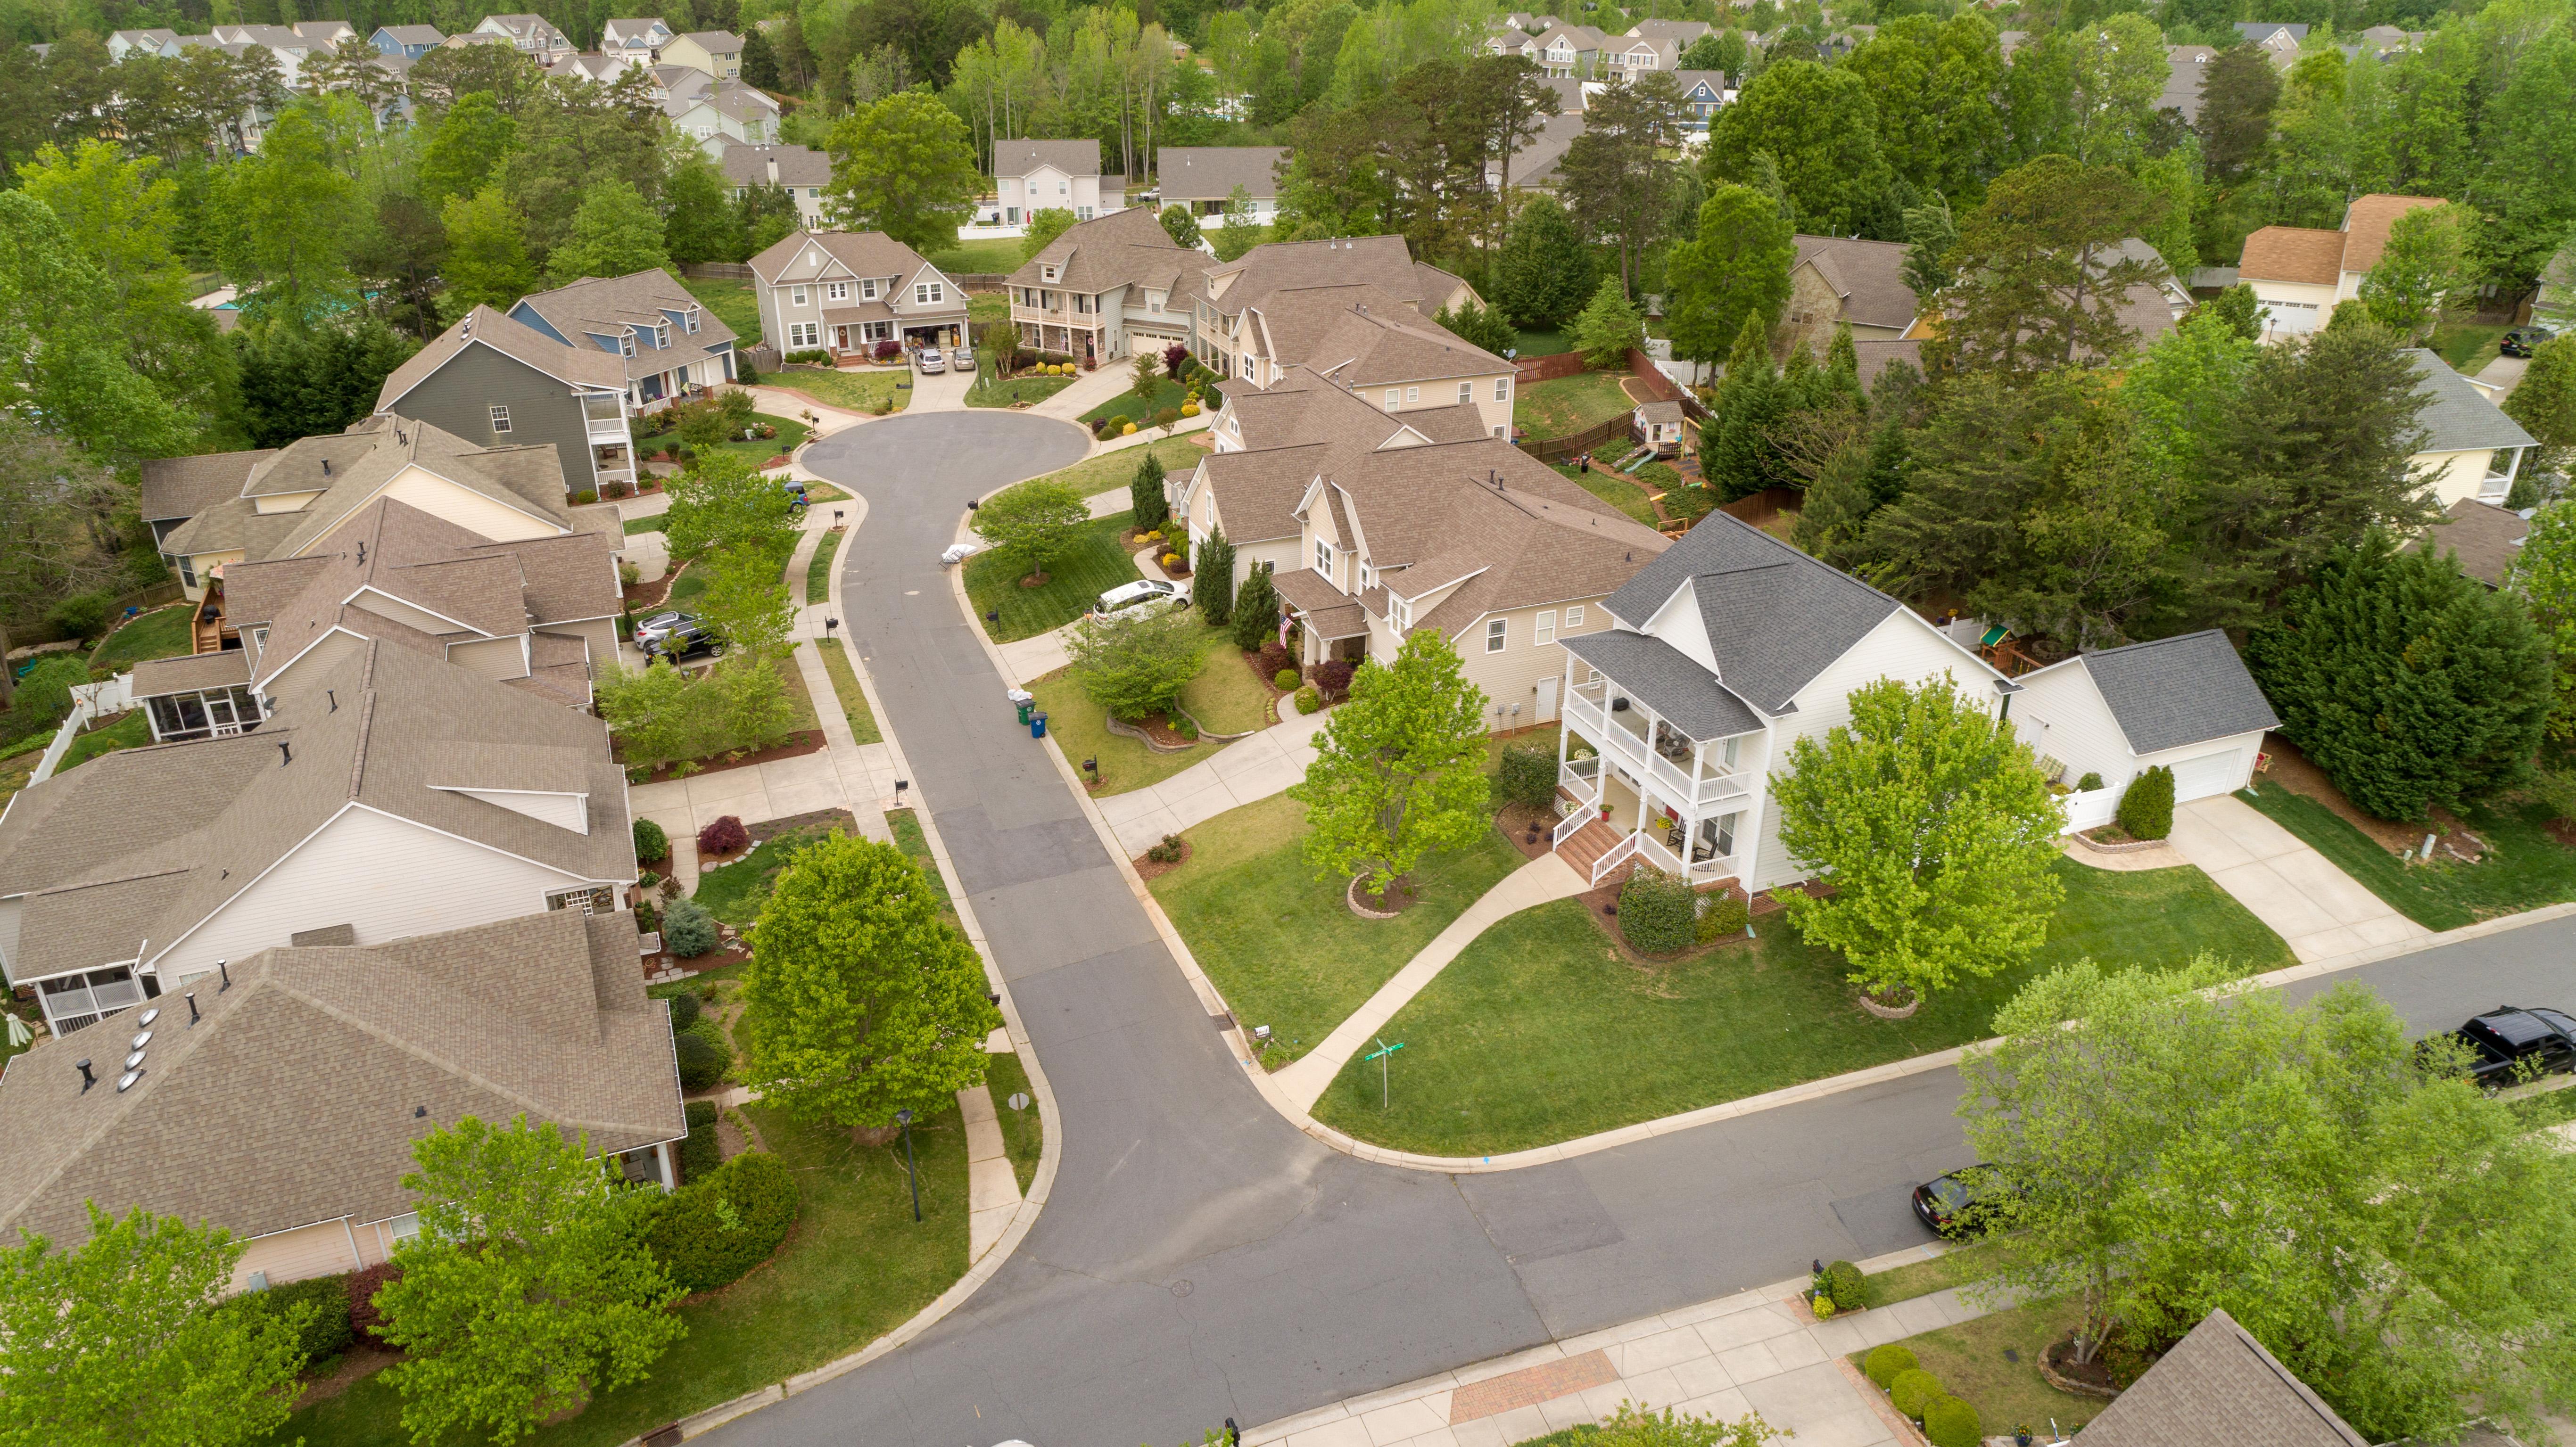 Street Aerial View